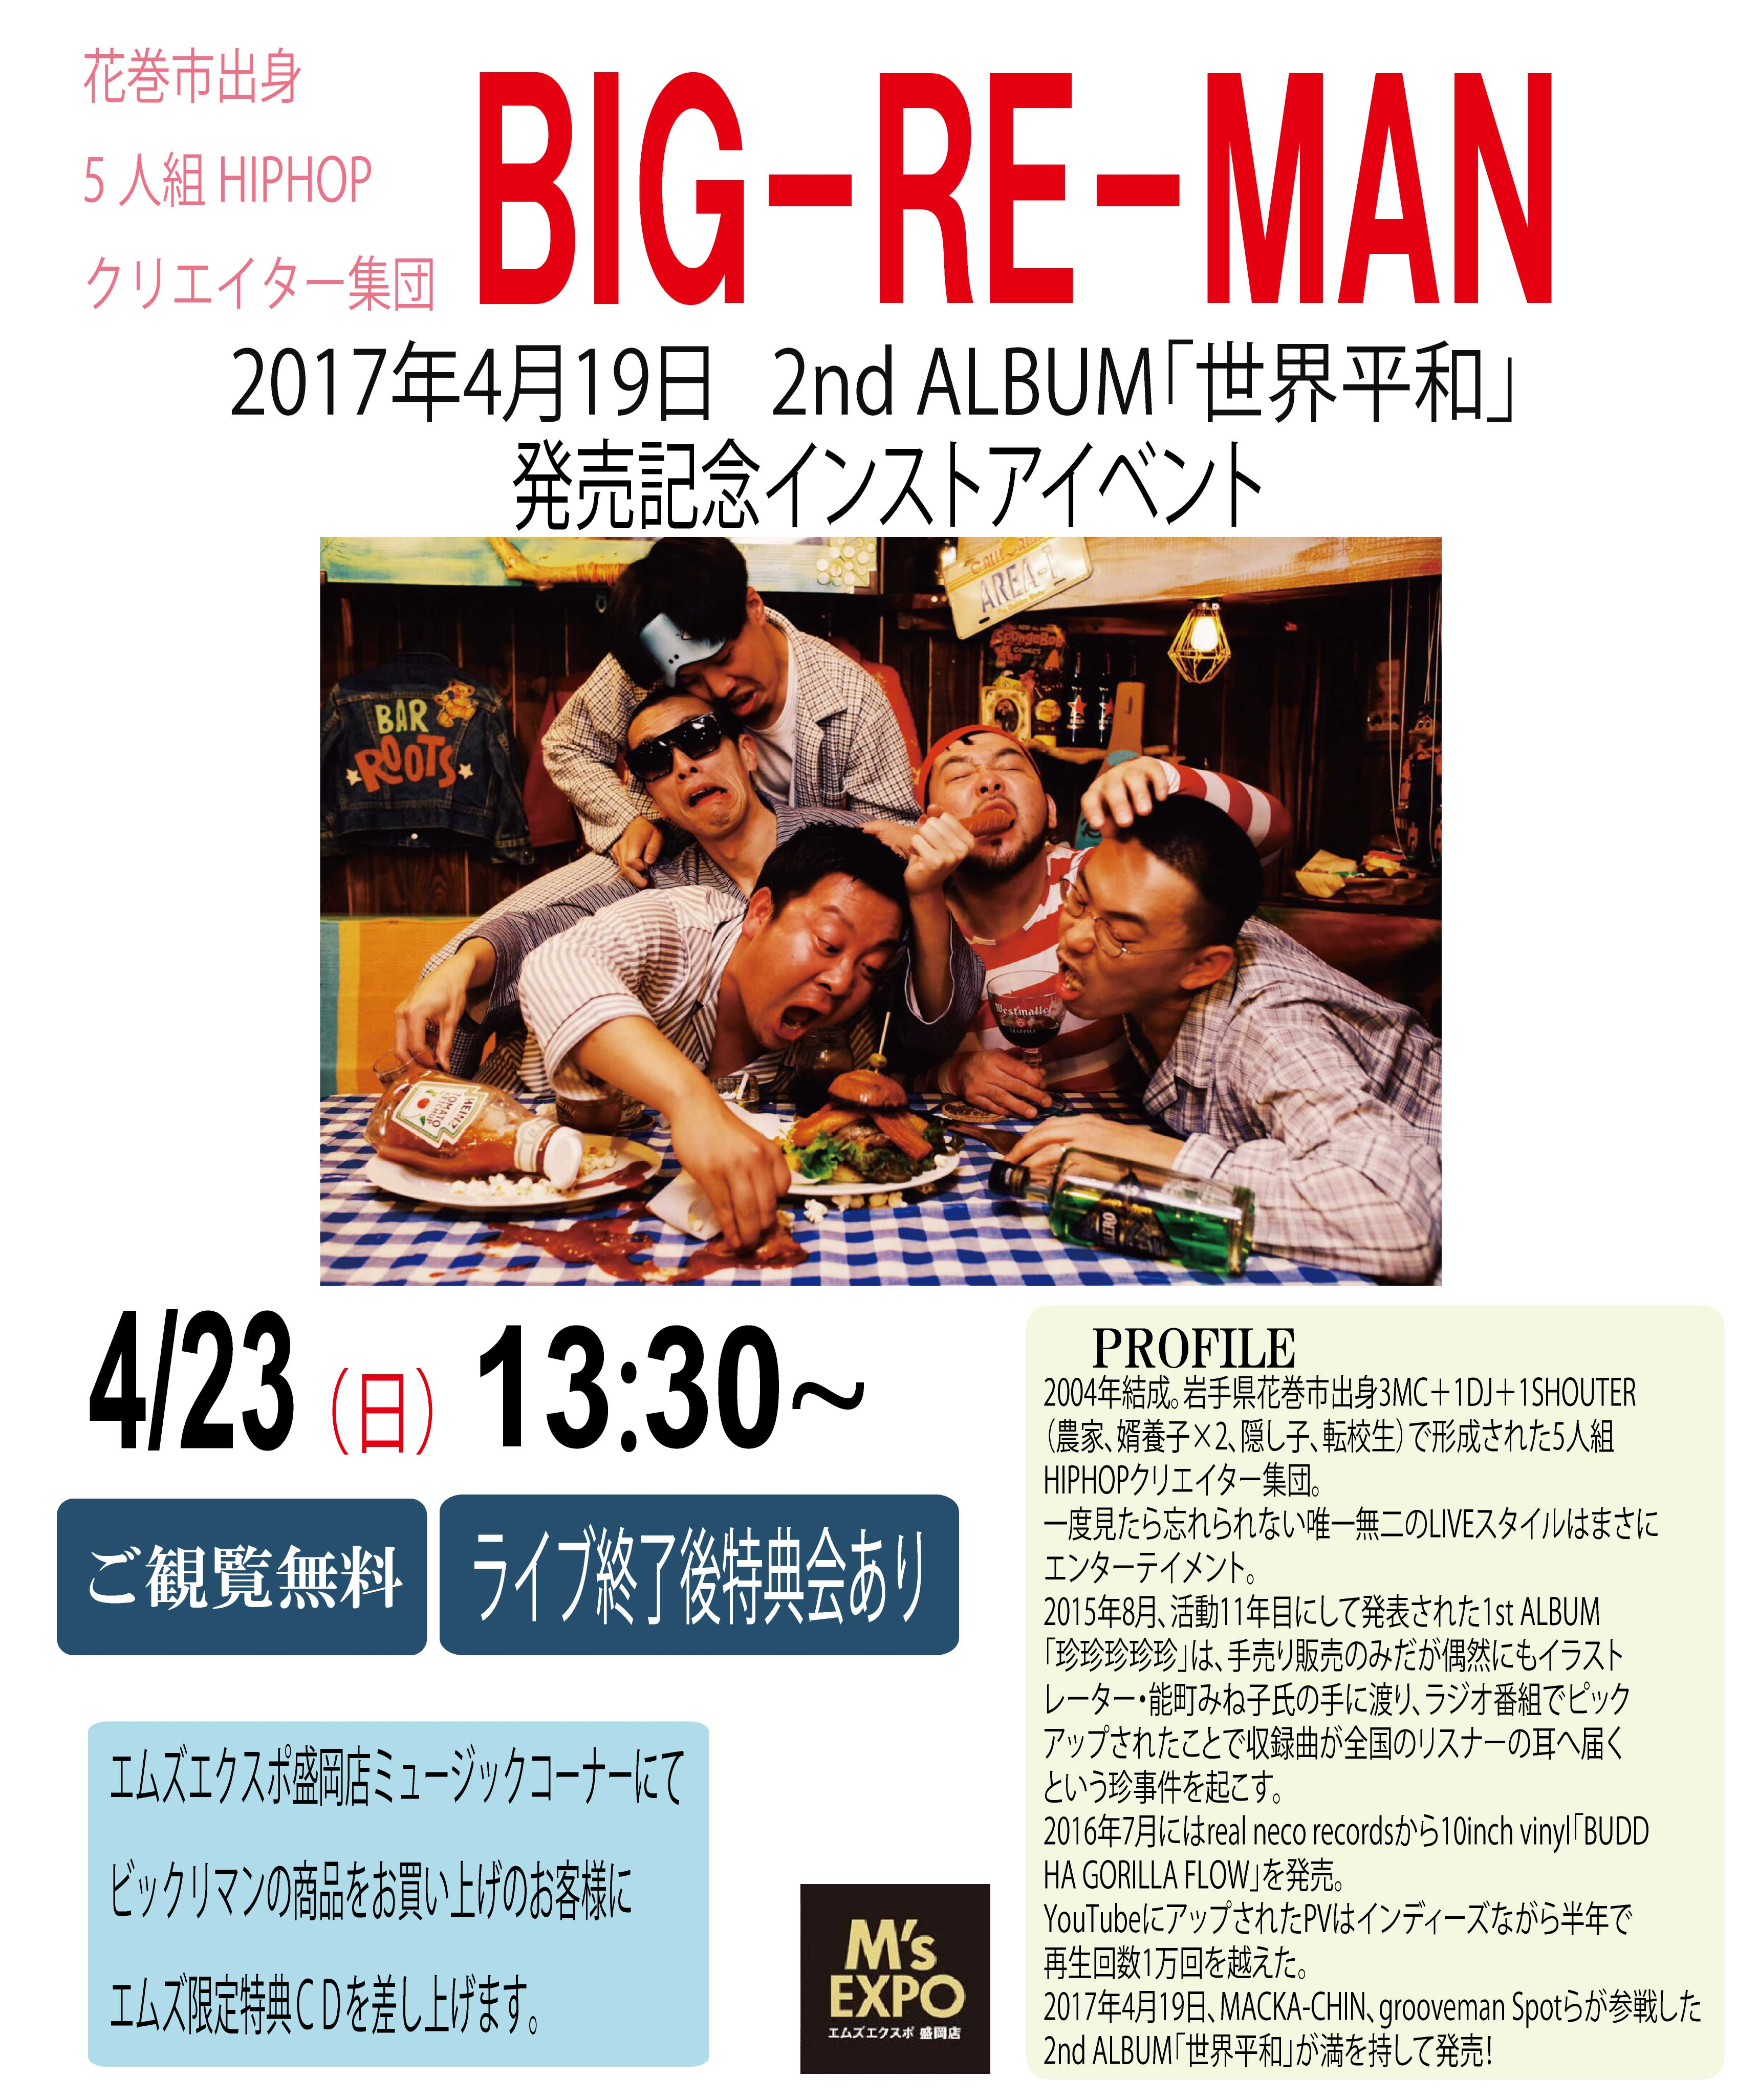 BIG-RE-MAN インストアイベント